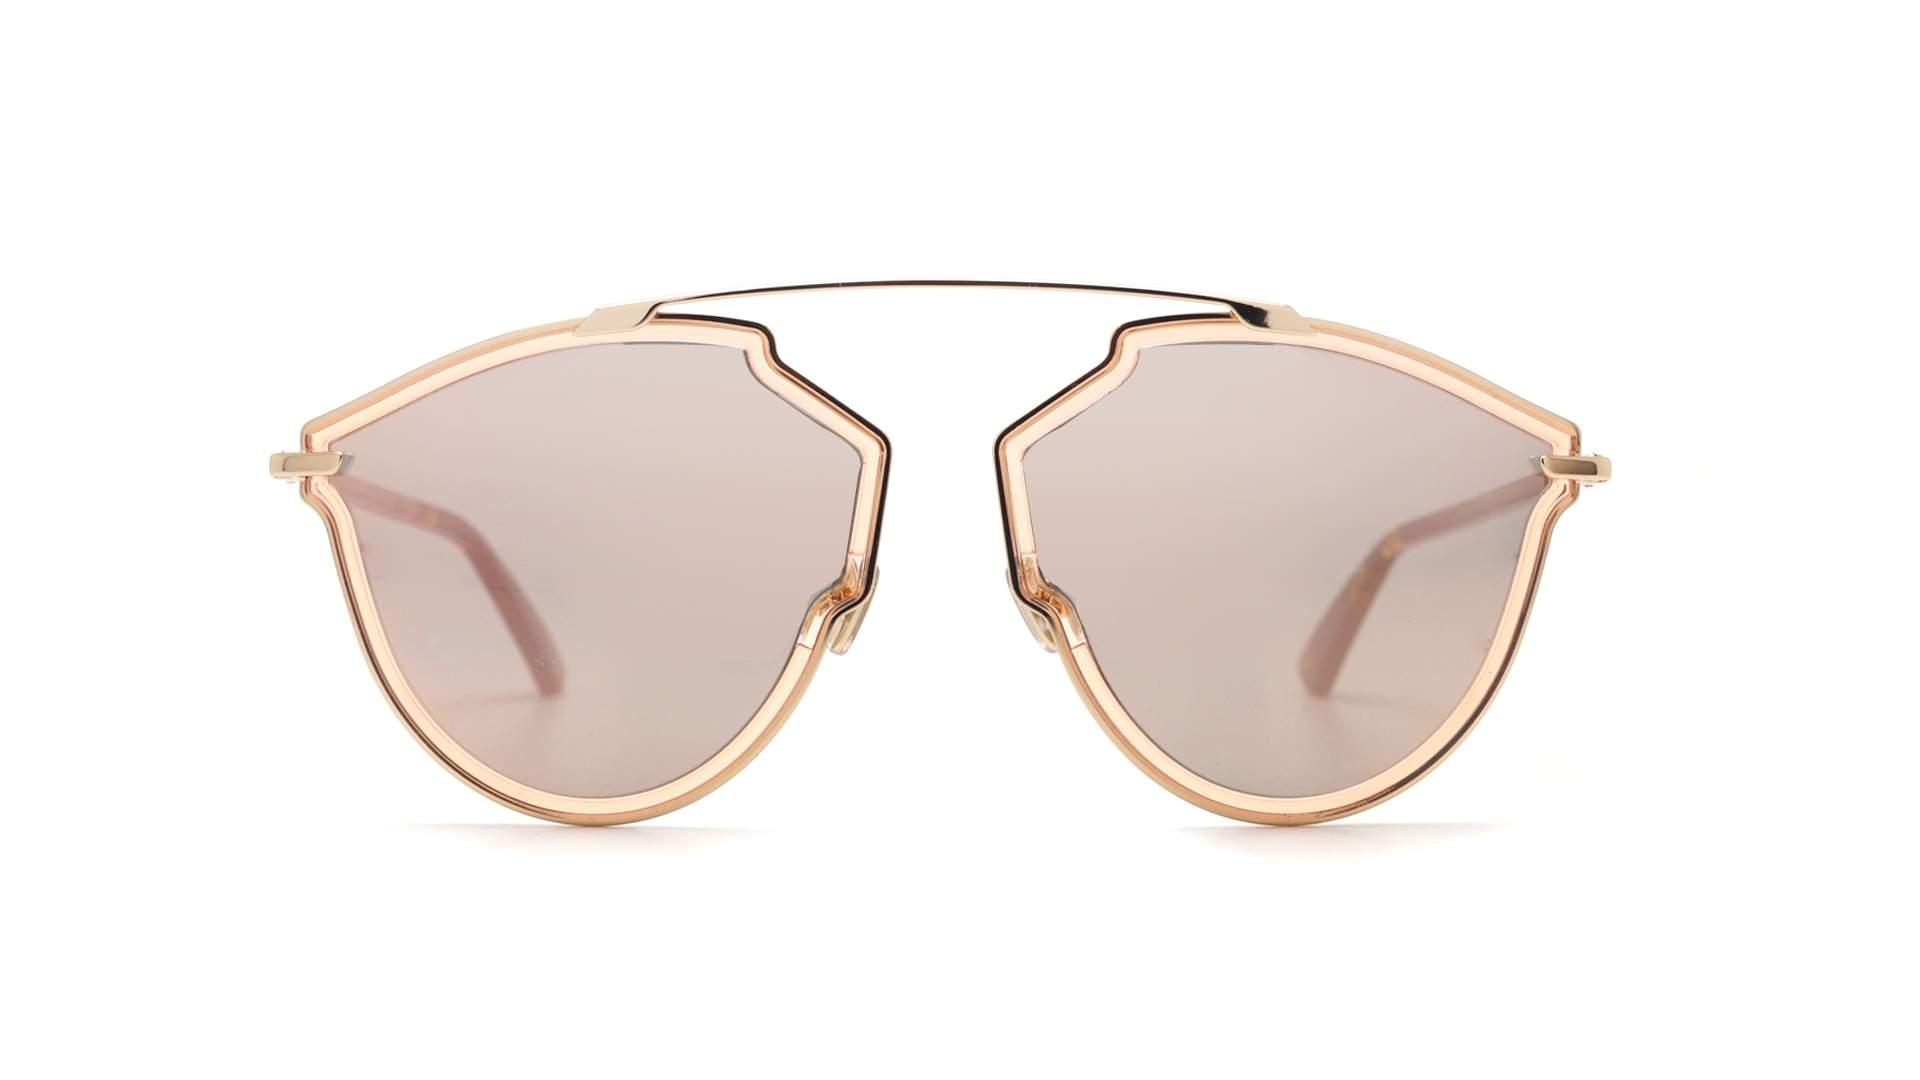 0f7ab951a0 Sunglasses Dior SoReal Rise Pink DIORSOREALRISE S450J 58-17 Large Mirror